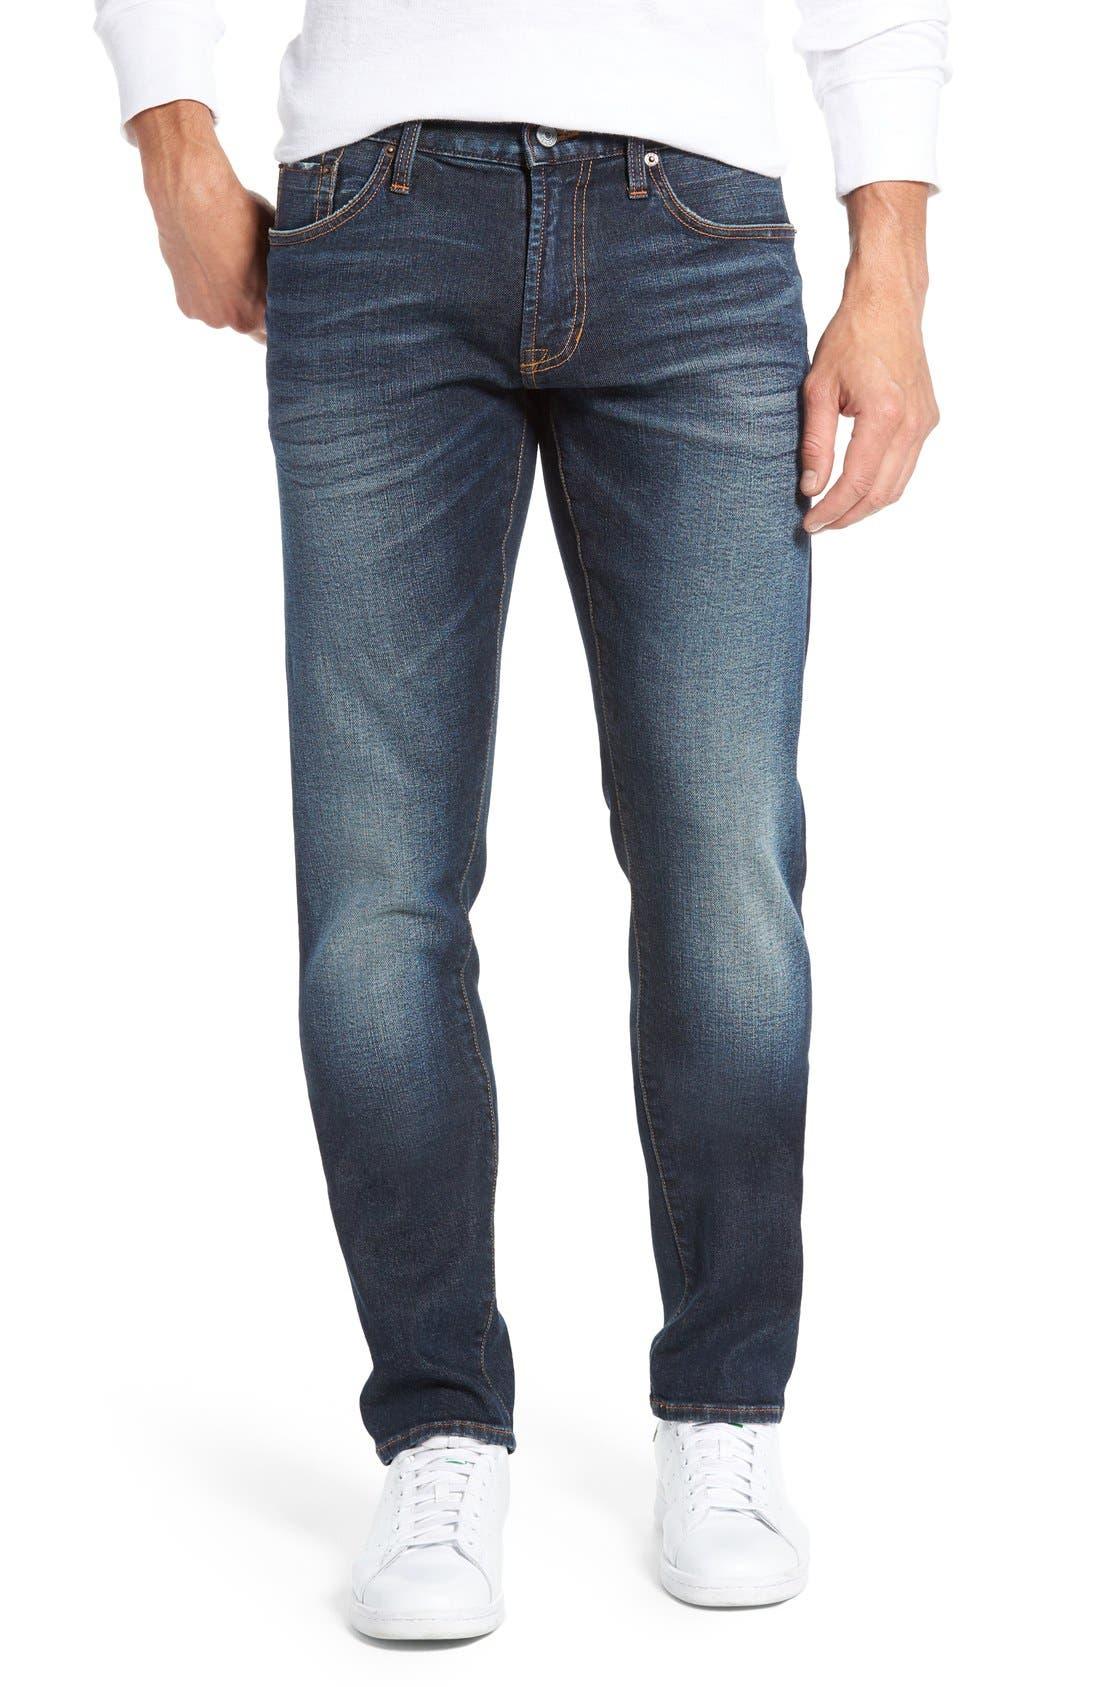 Jean Shop Jim Stretch Selvedge Slim Fit Jeans (Court Blue)